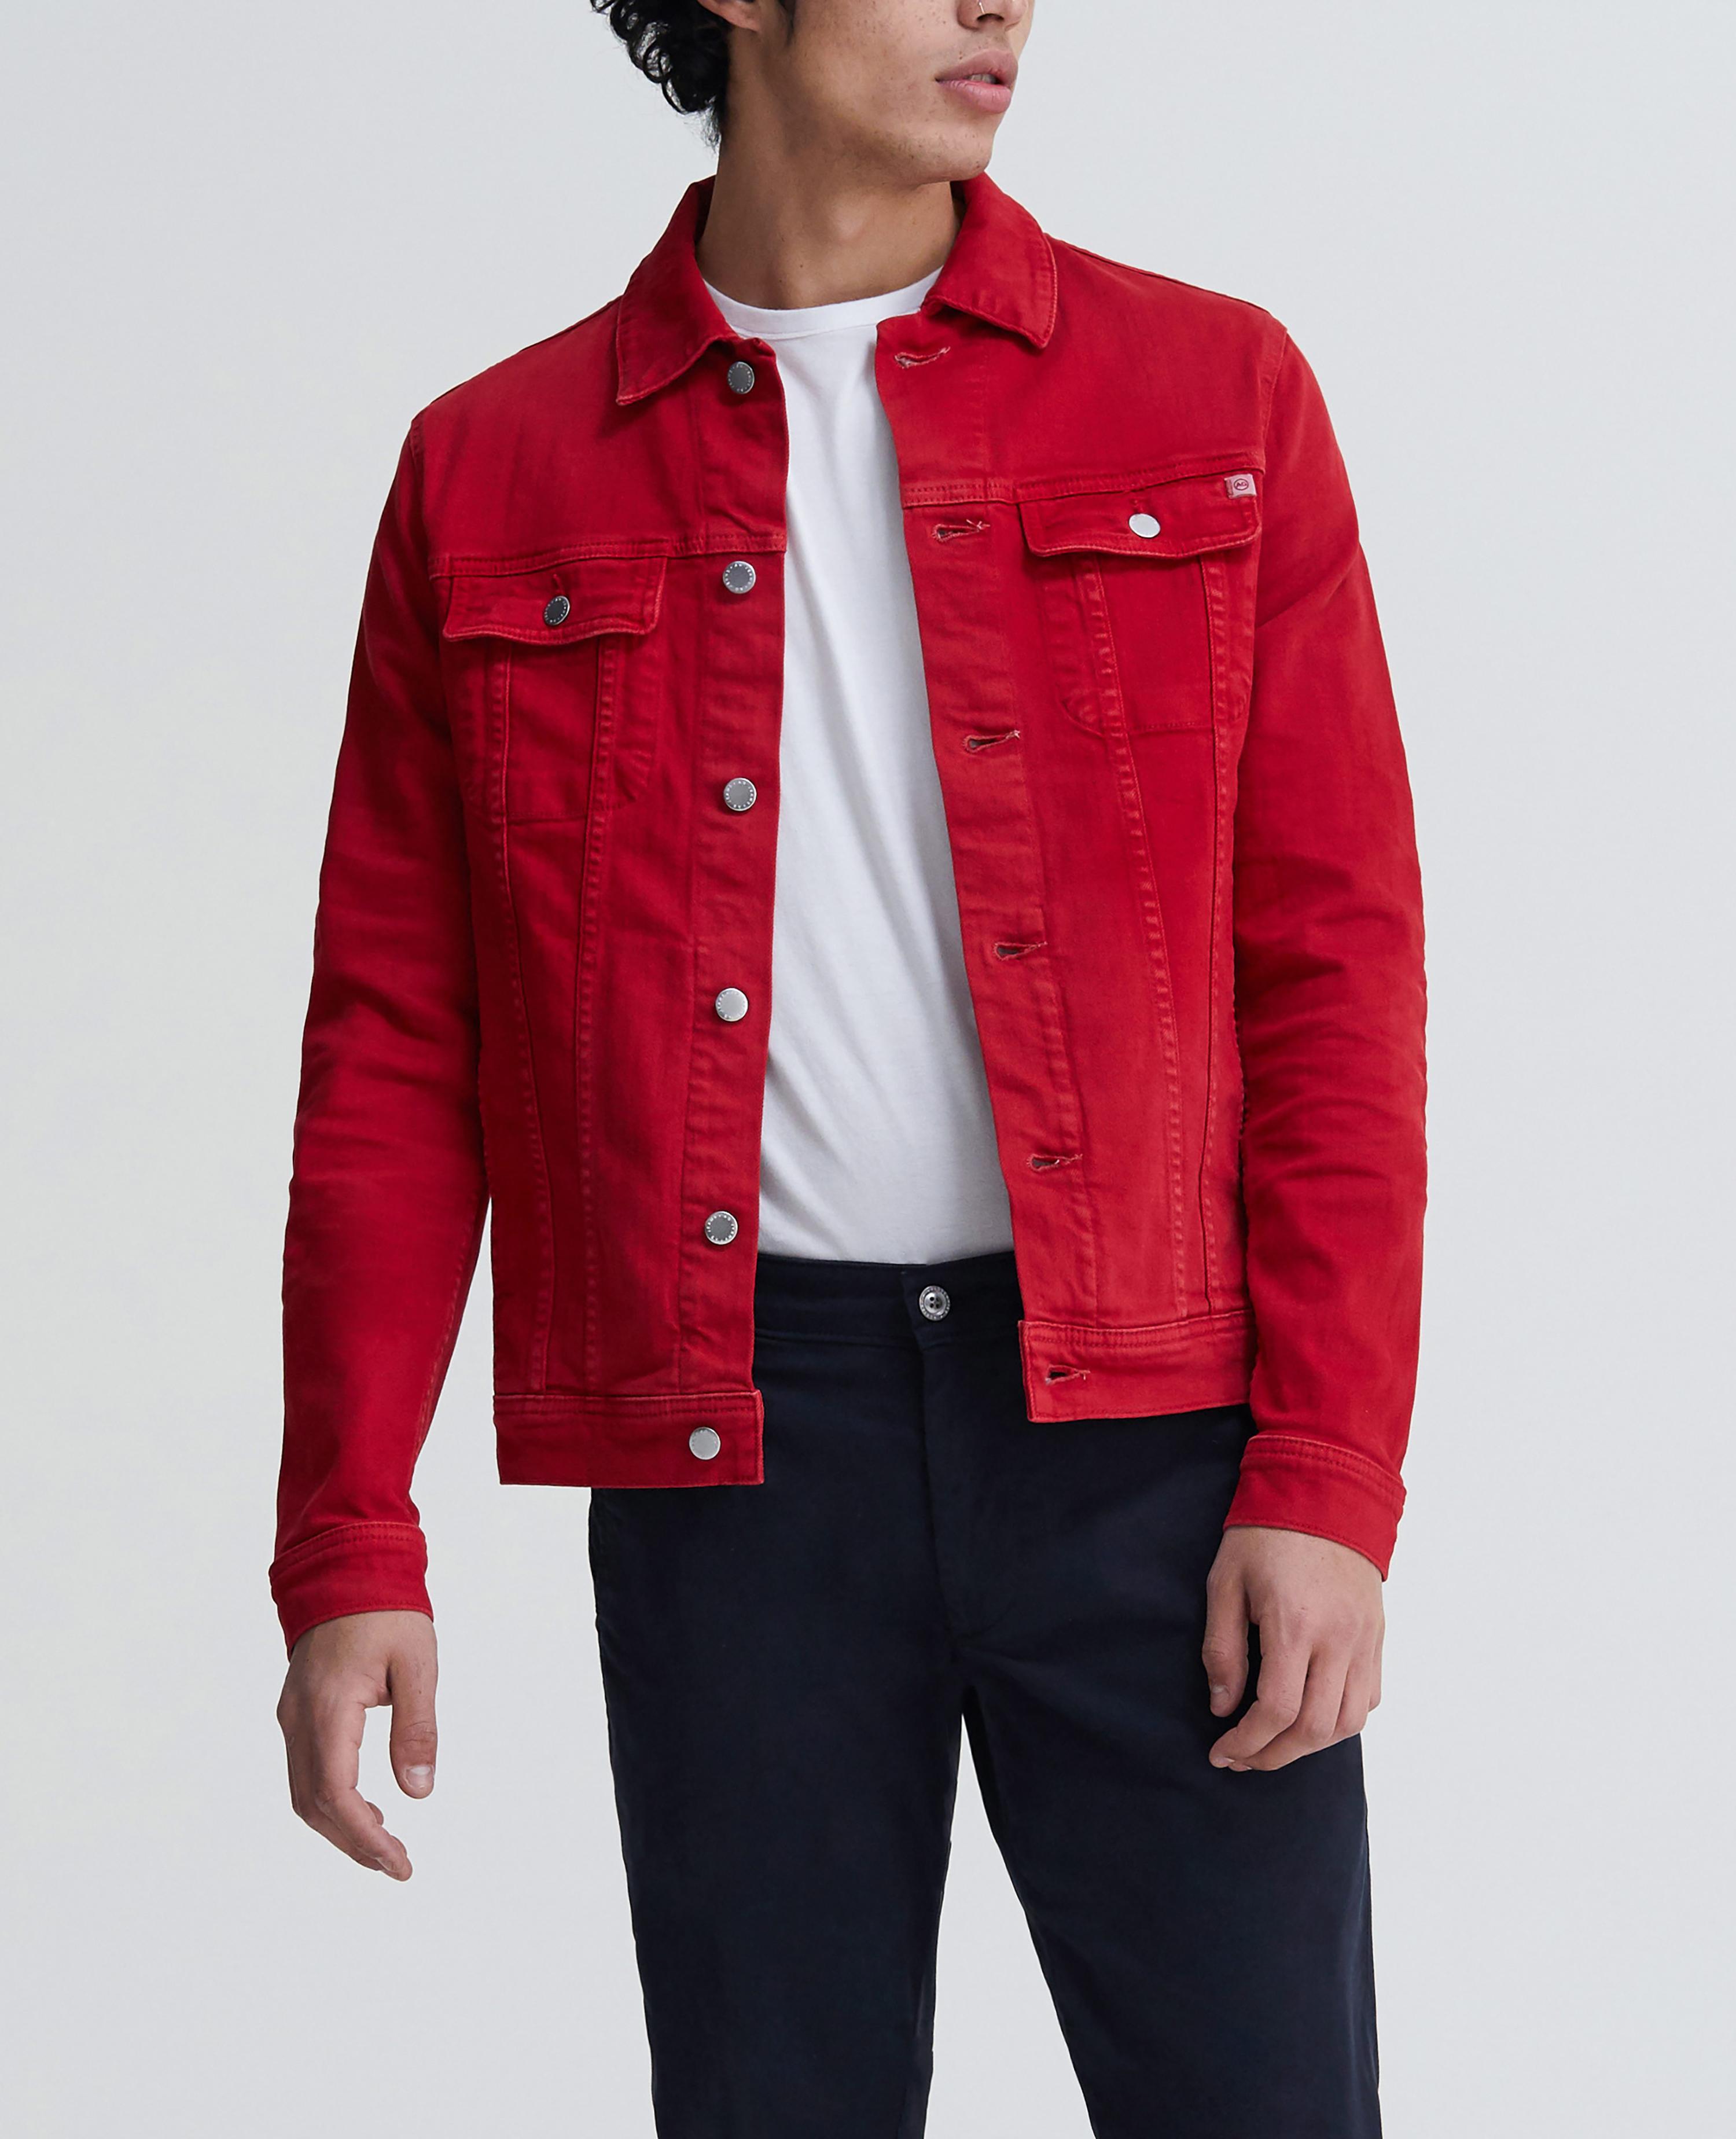 The Dart Jacket